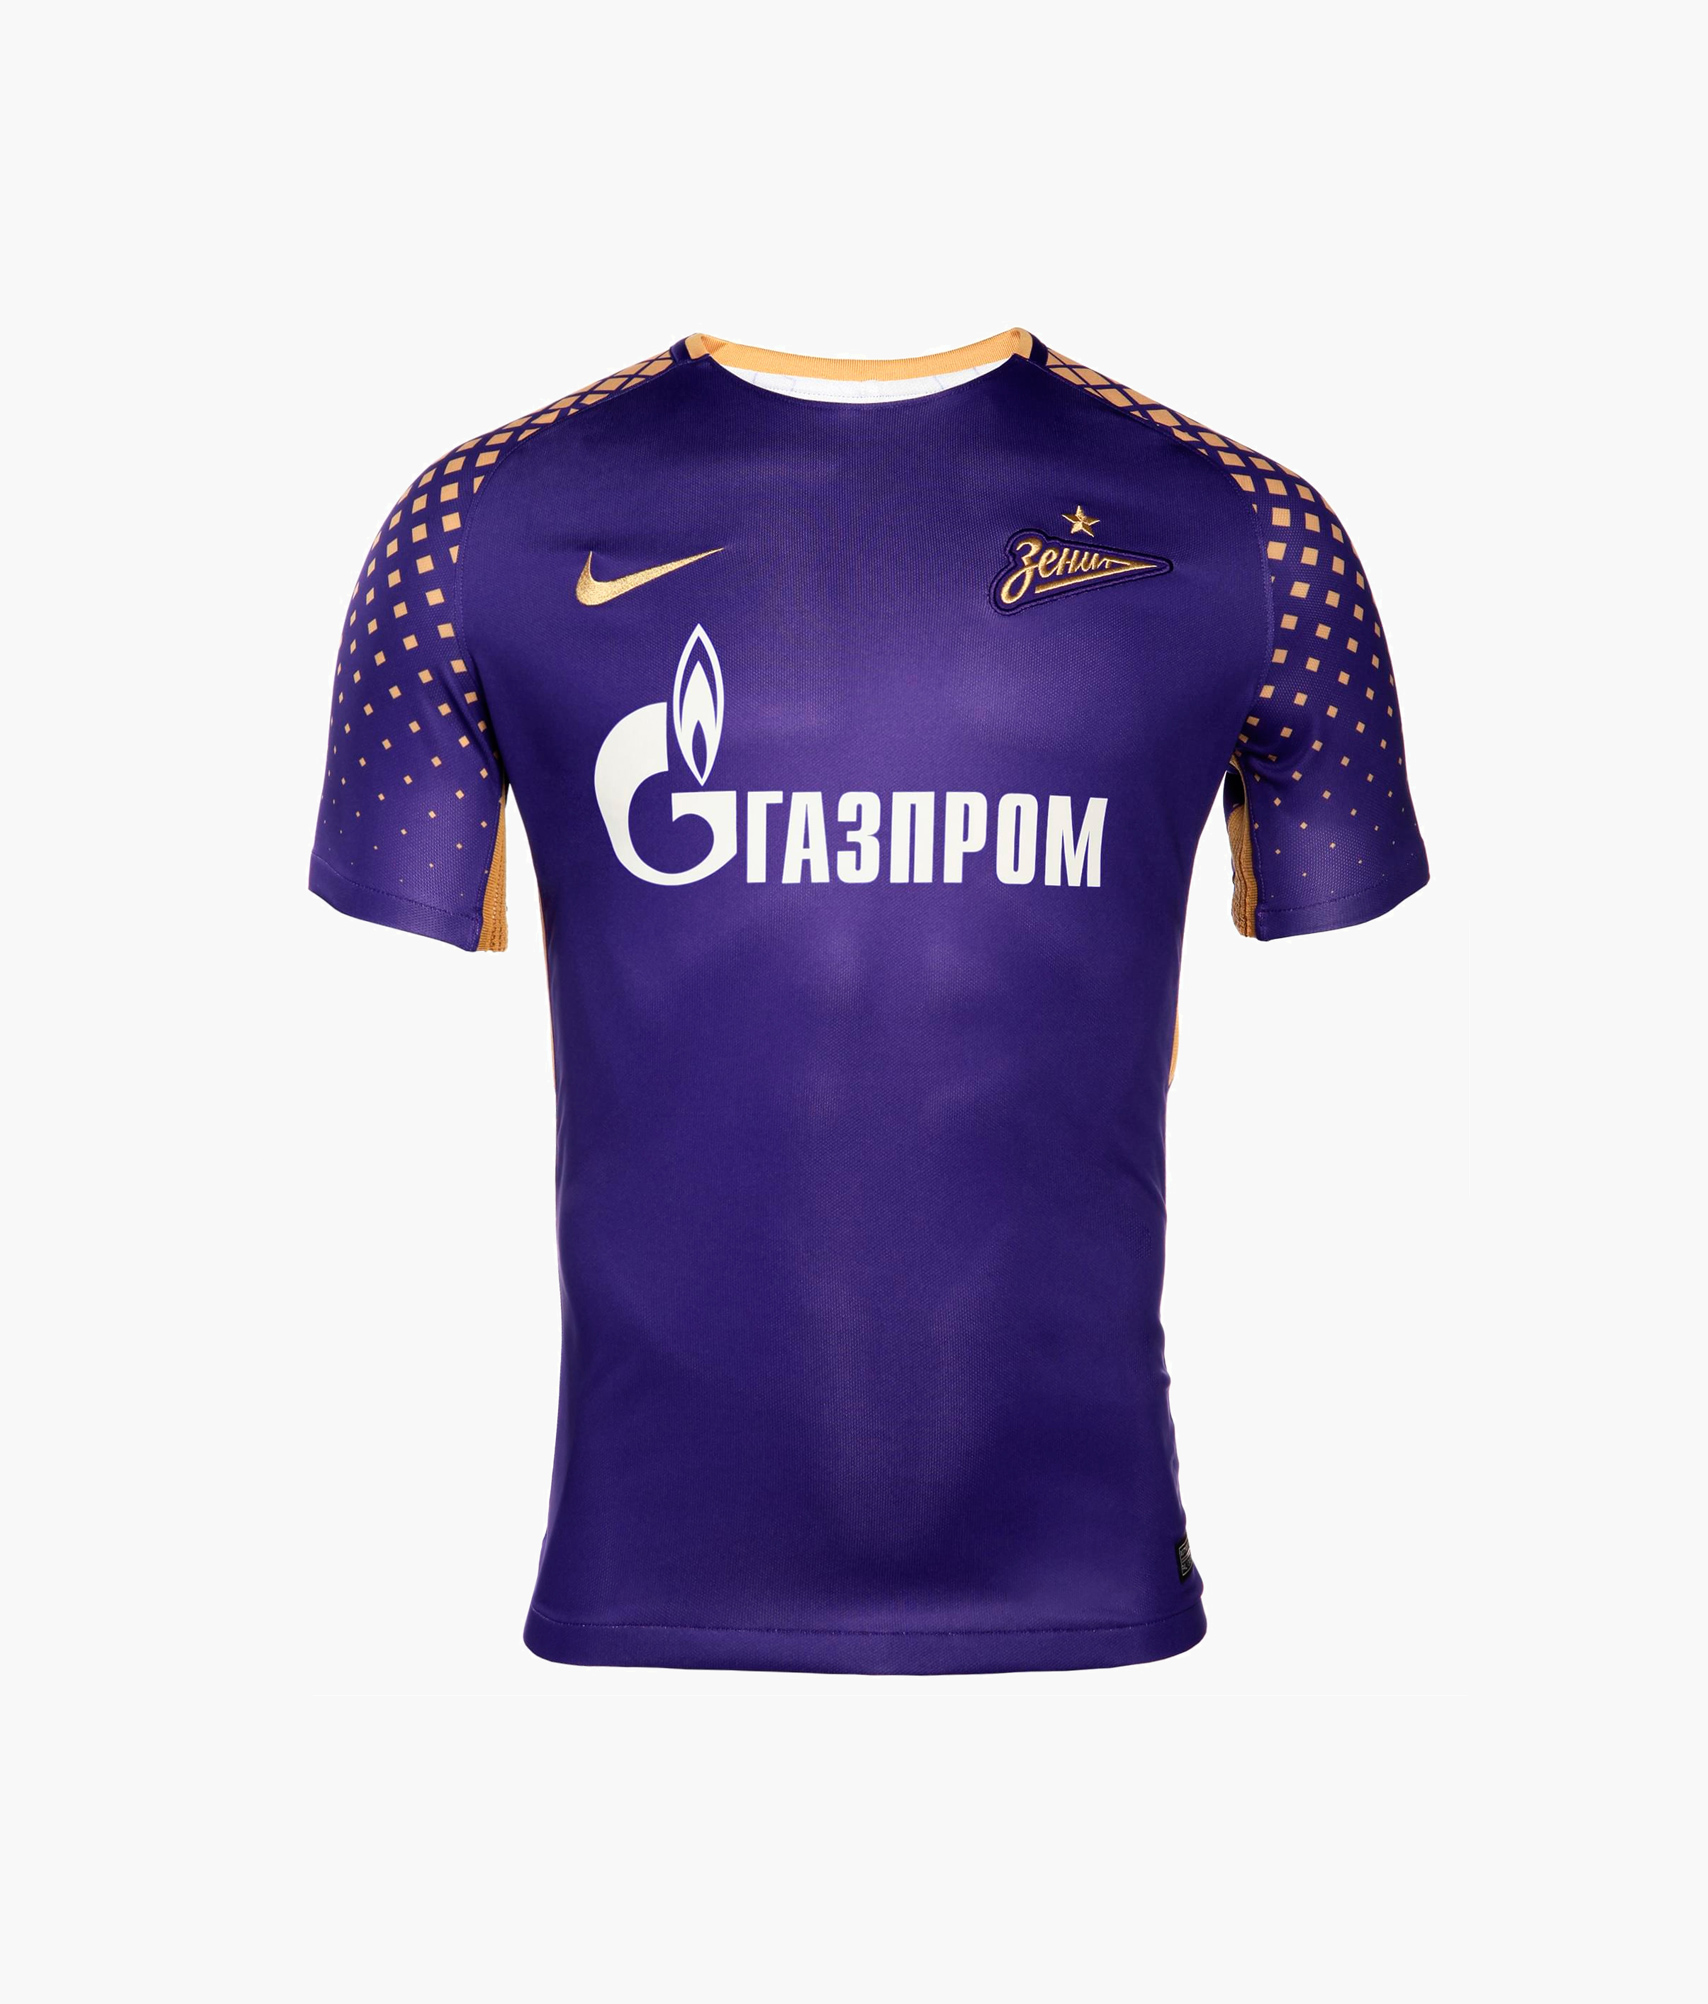 Оригинальная резервная футболка Nike сезона 2017/2018 Nike Цвет-Фиолетовый puma толстовка bmw msp hooded sweat jacket